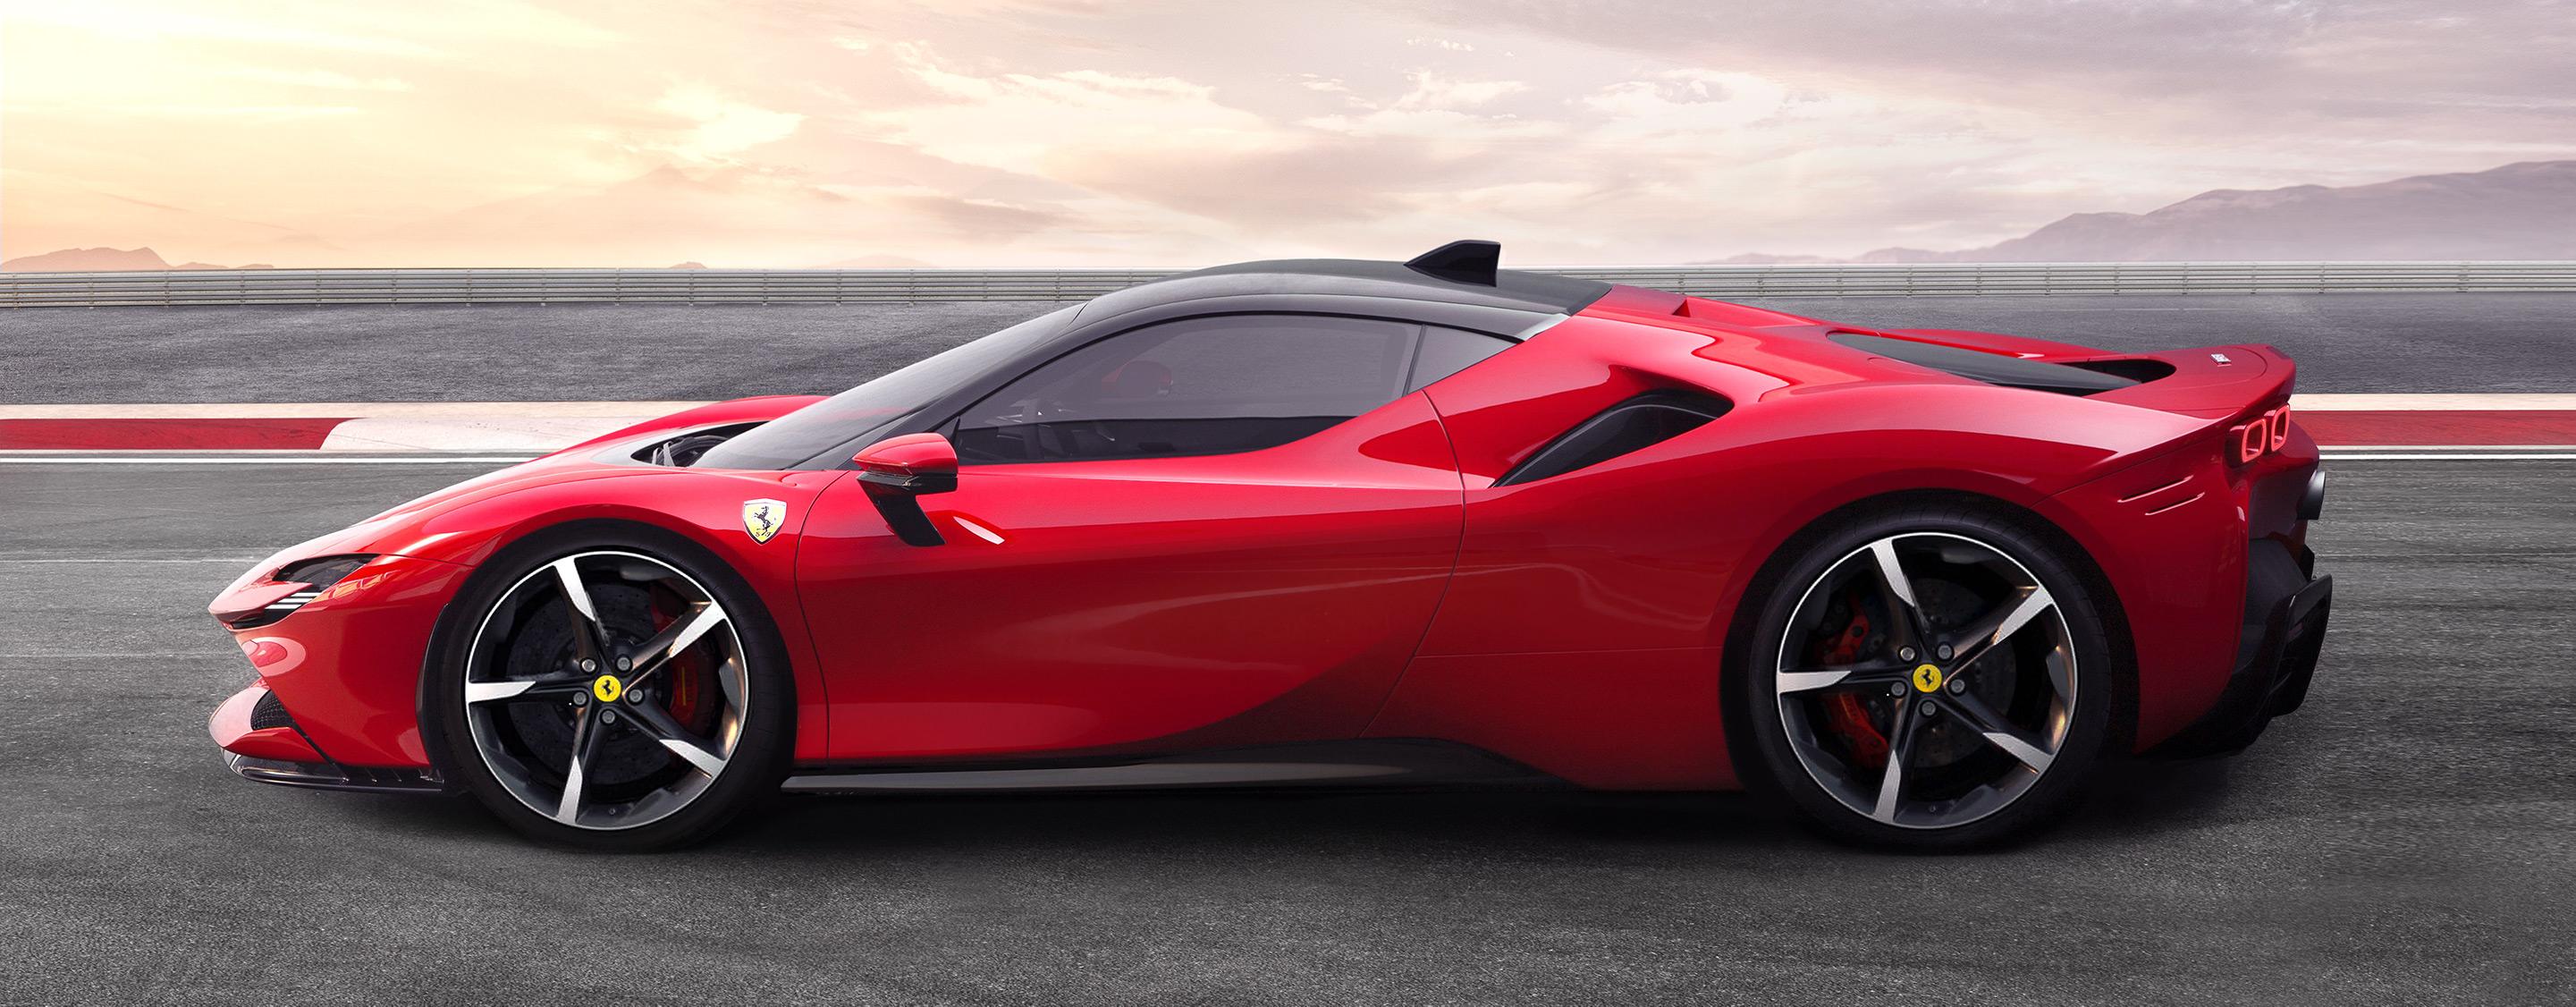 TrackWorthy - Ferrari SF90 Stradale PHEV (1)